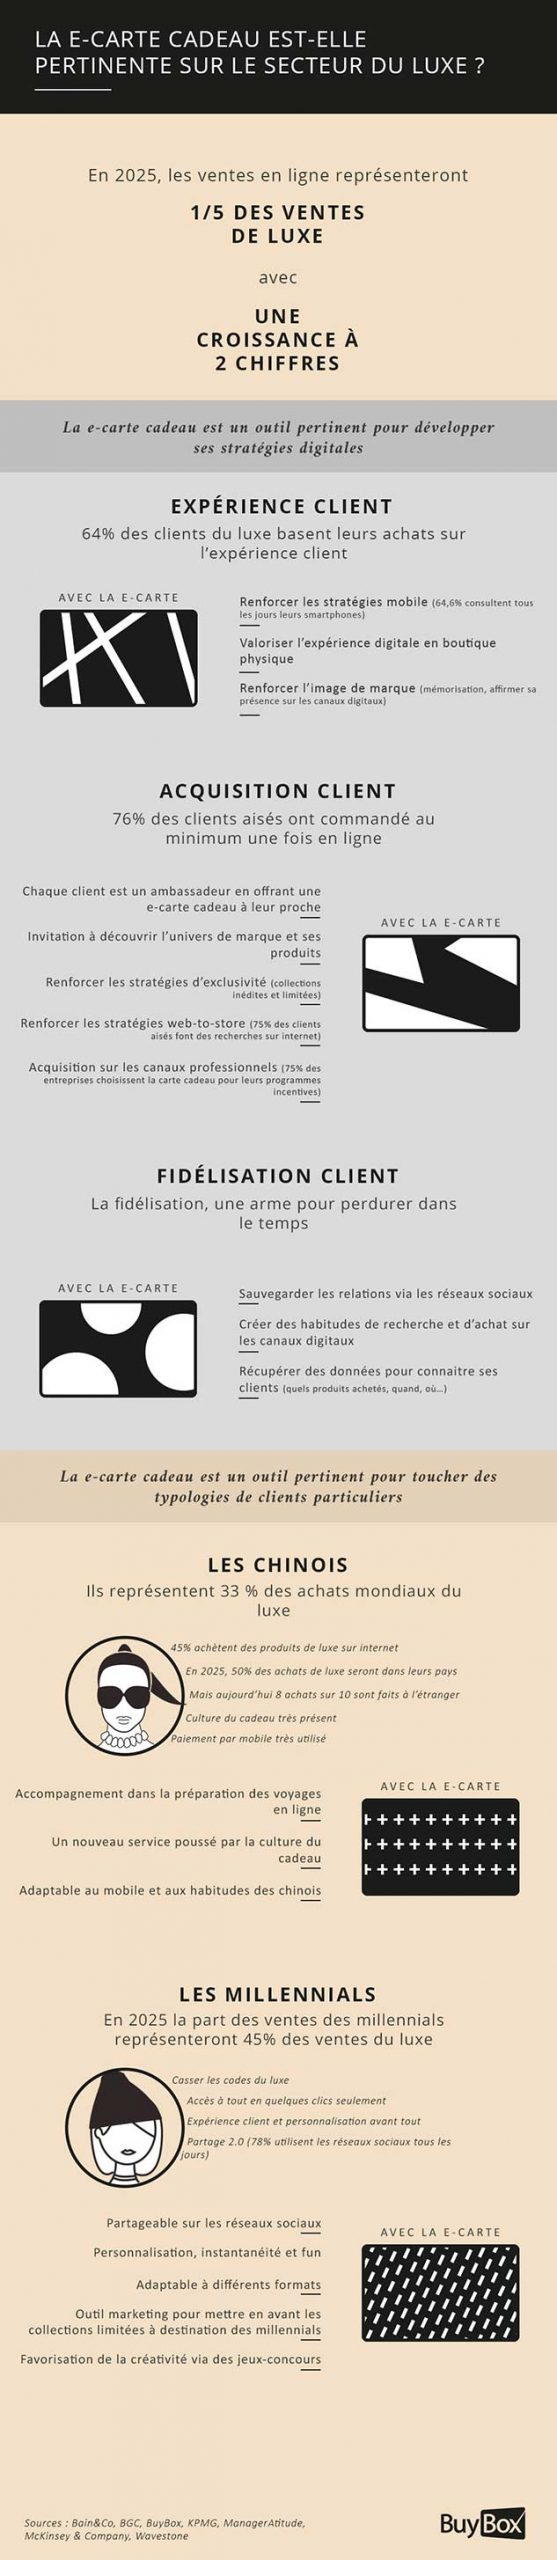 infographie ecarte cadeau luxe